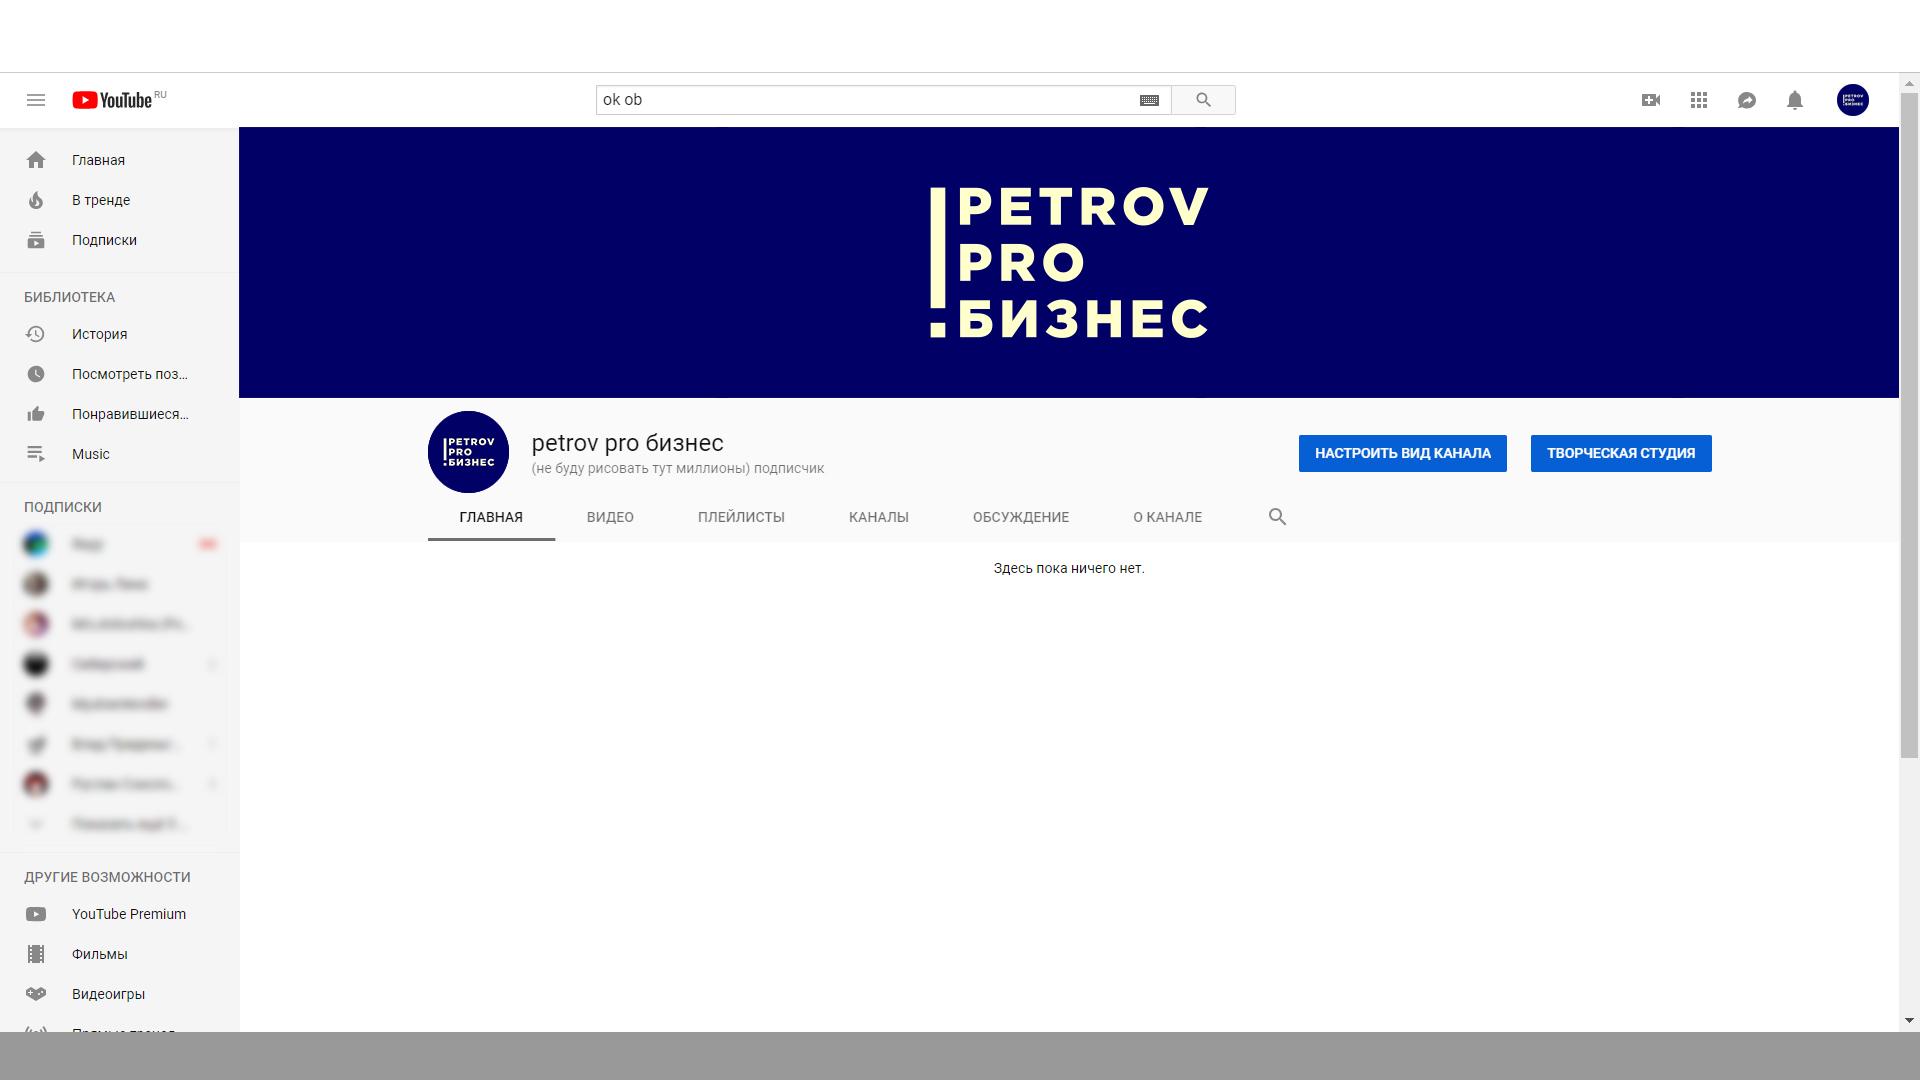 Создать логотип для YouTube канала  фото f_9665bfda823388ee.jpg